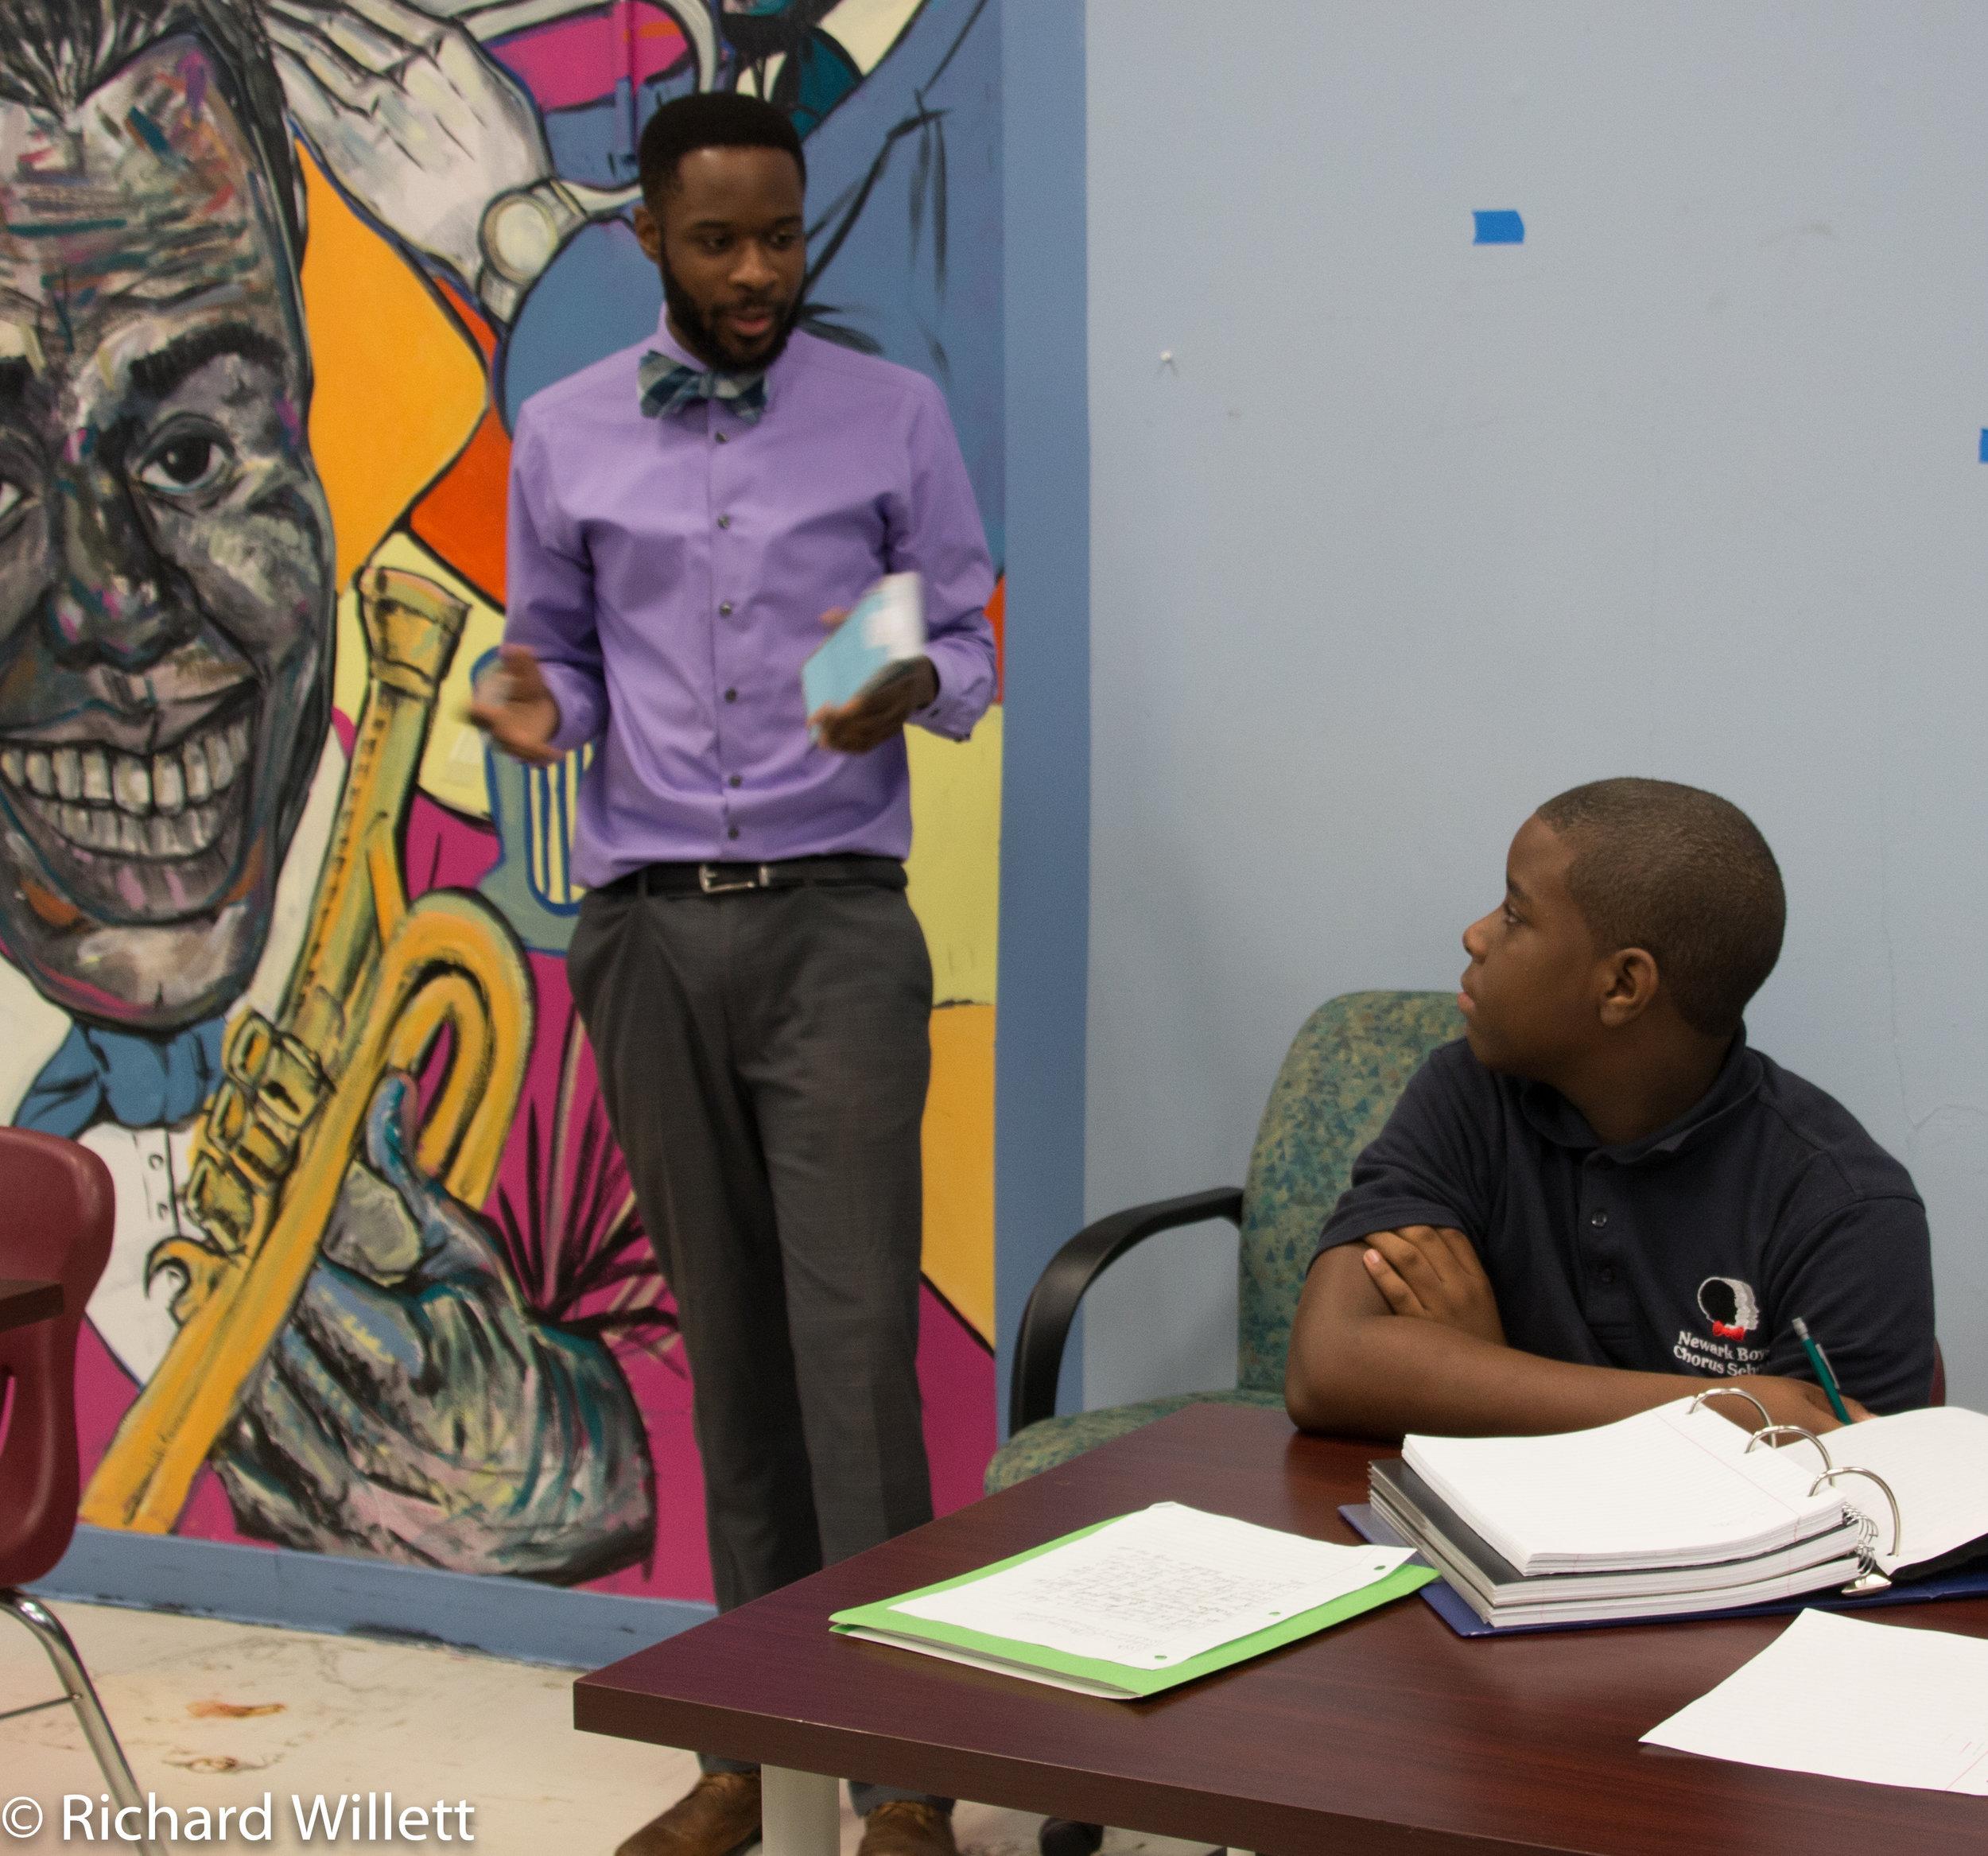 - Mr. Binger explains social demonstrations to students